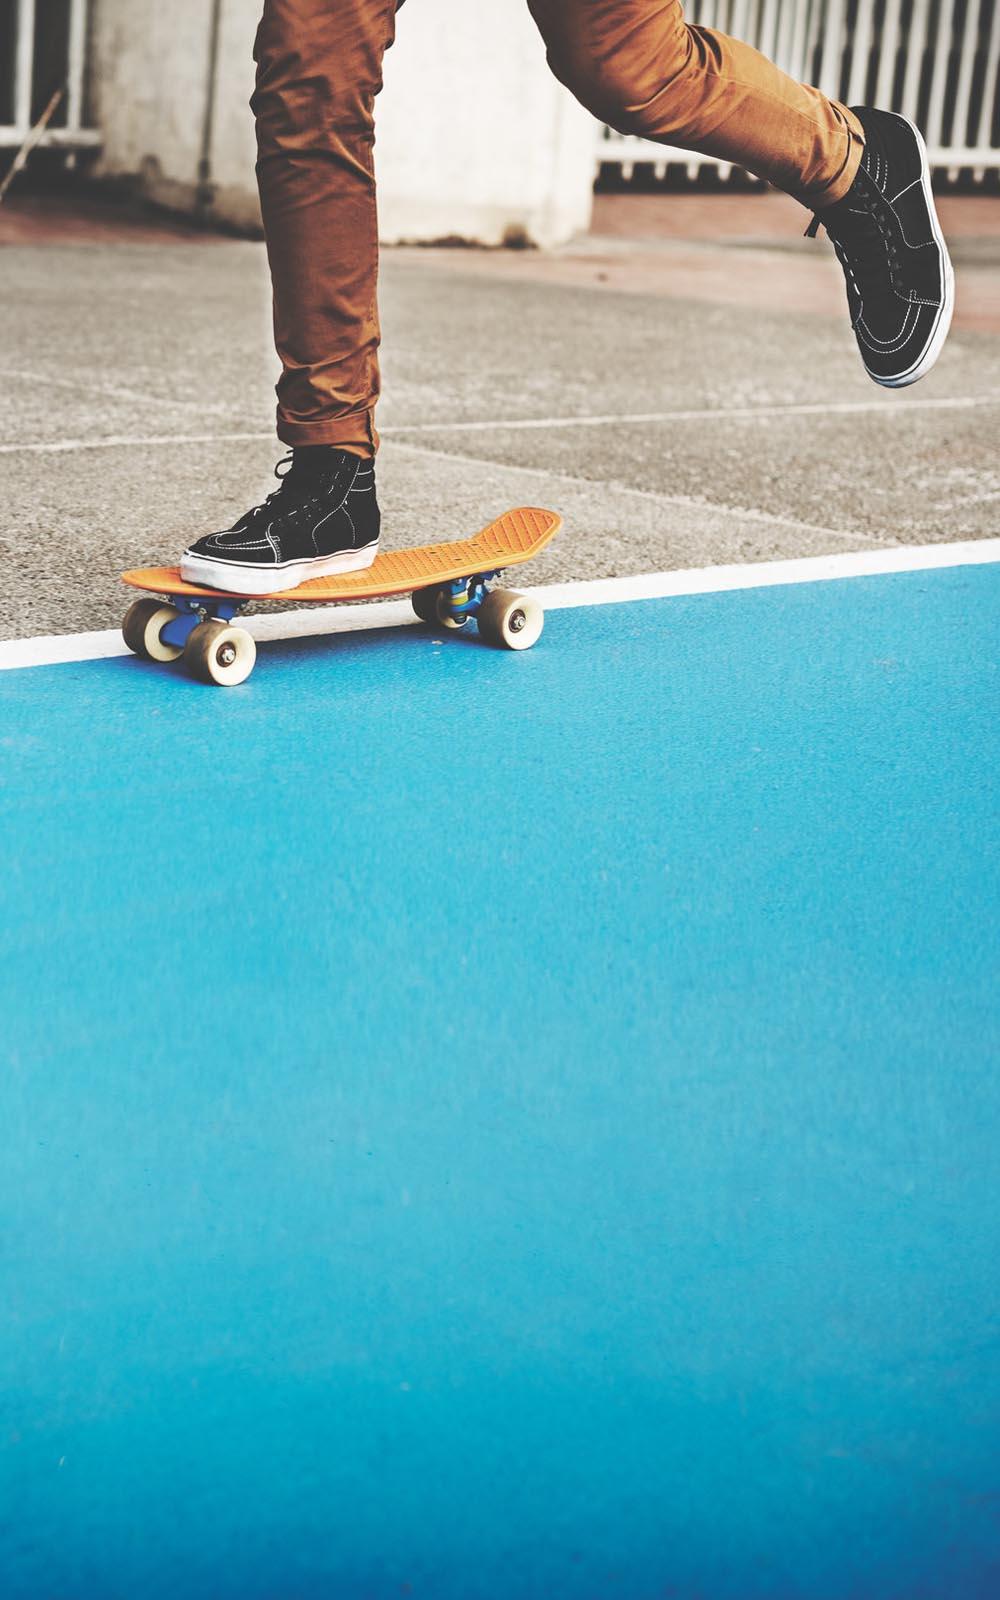 Simply skateboarding download free 100 pure hd quality - Skateboard mobel ...